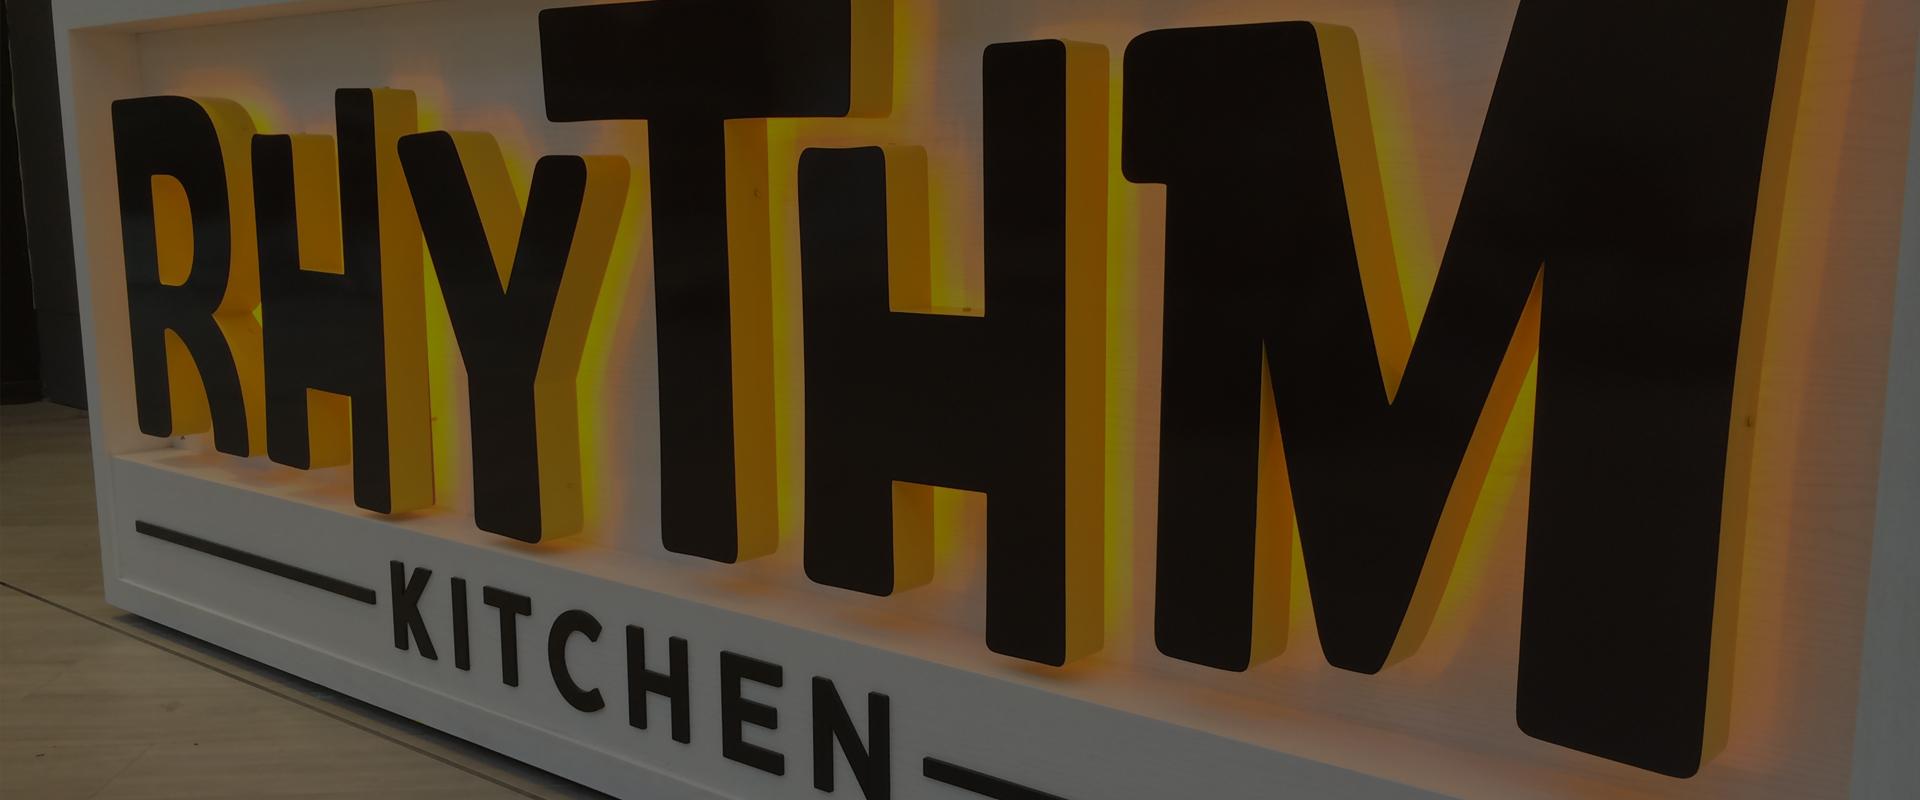 rhythm kitchen internal illuminated signage